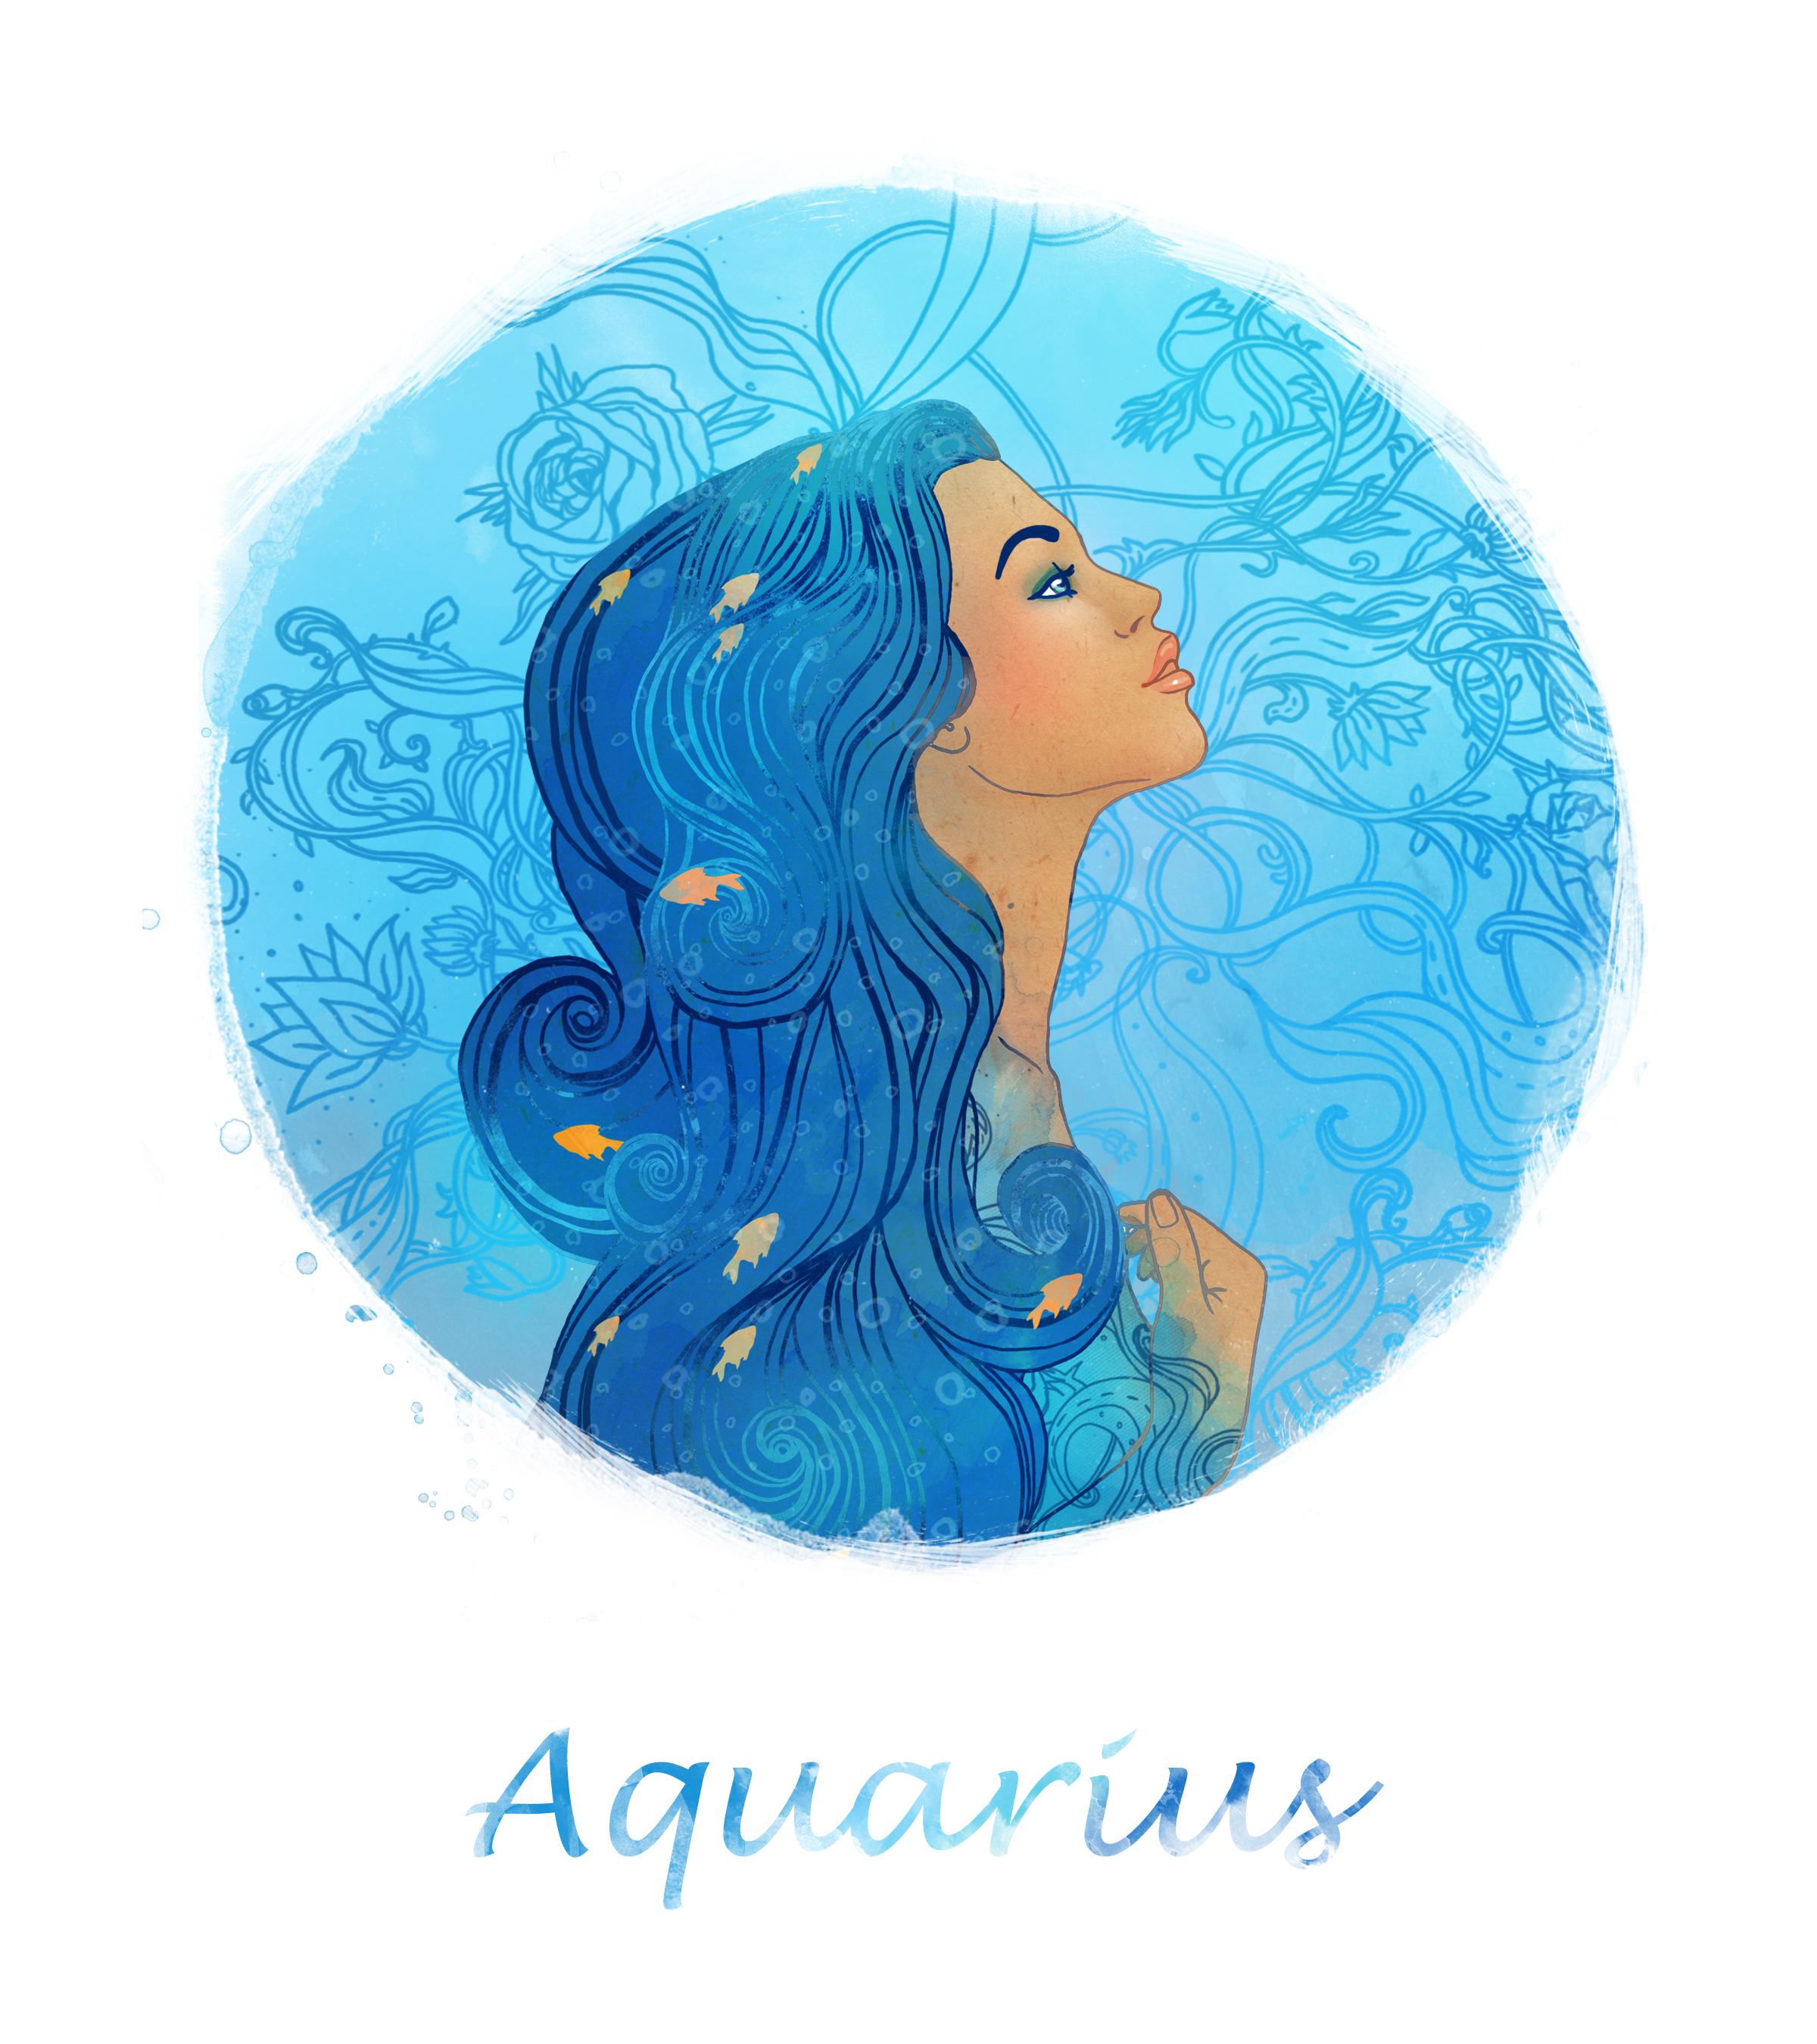 Картинки знака зодиака водолей для девочки